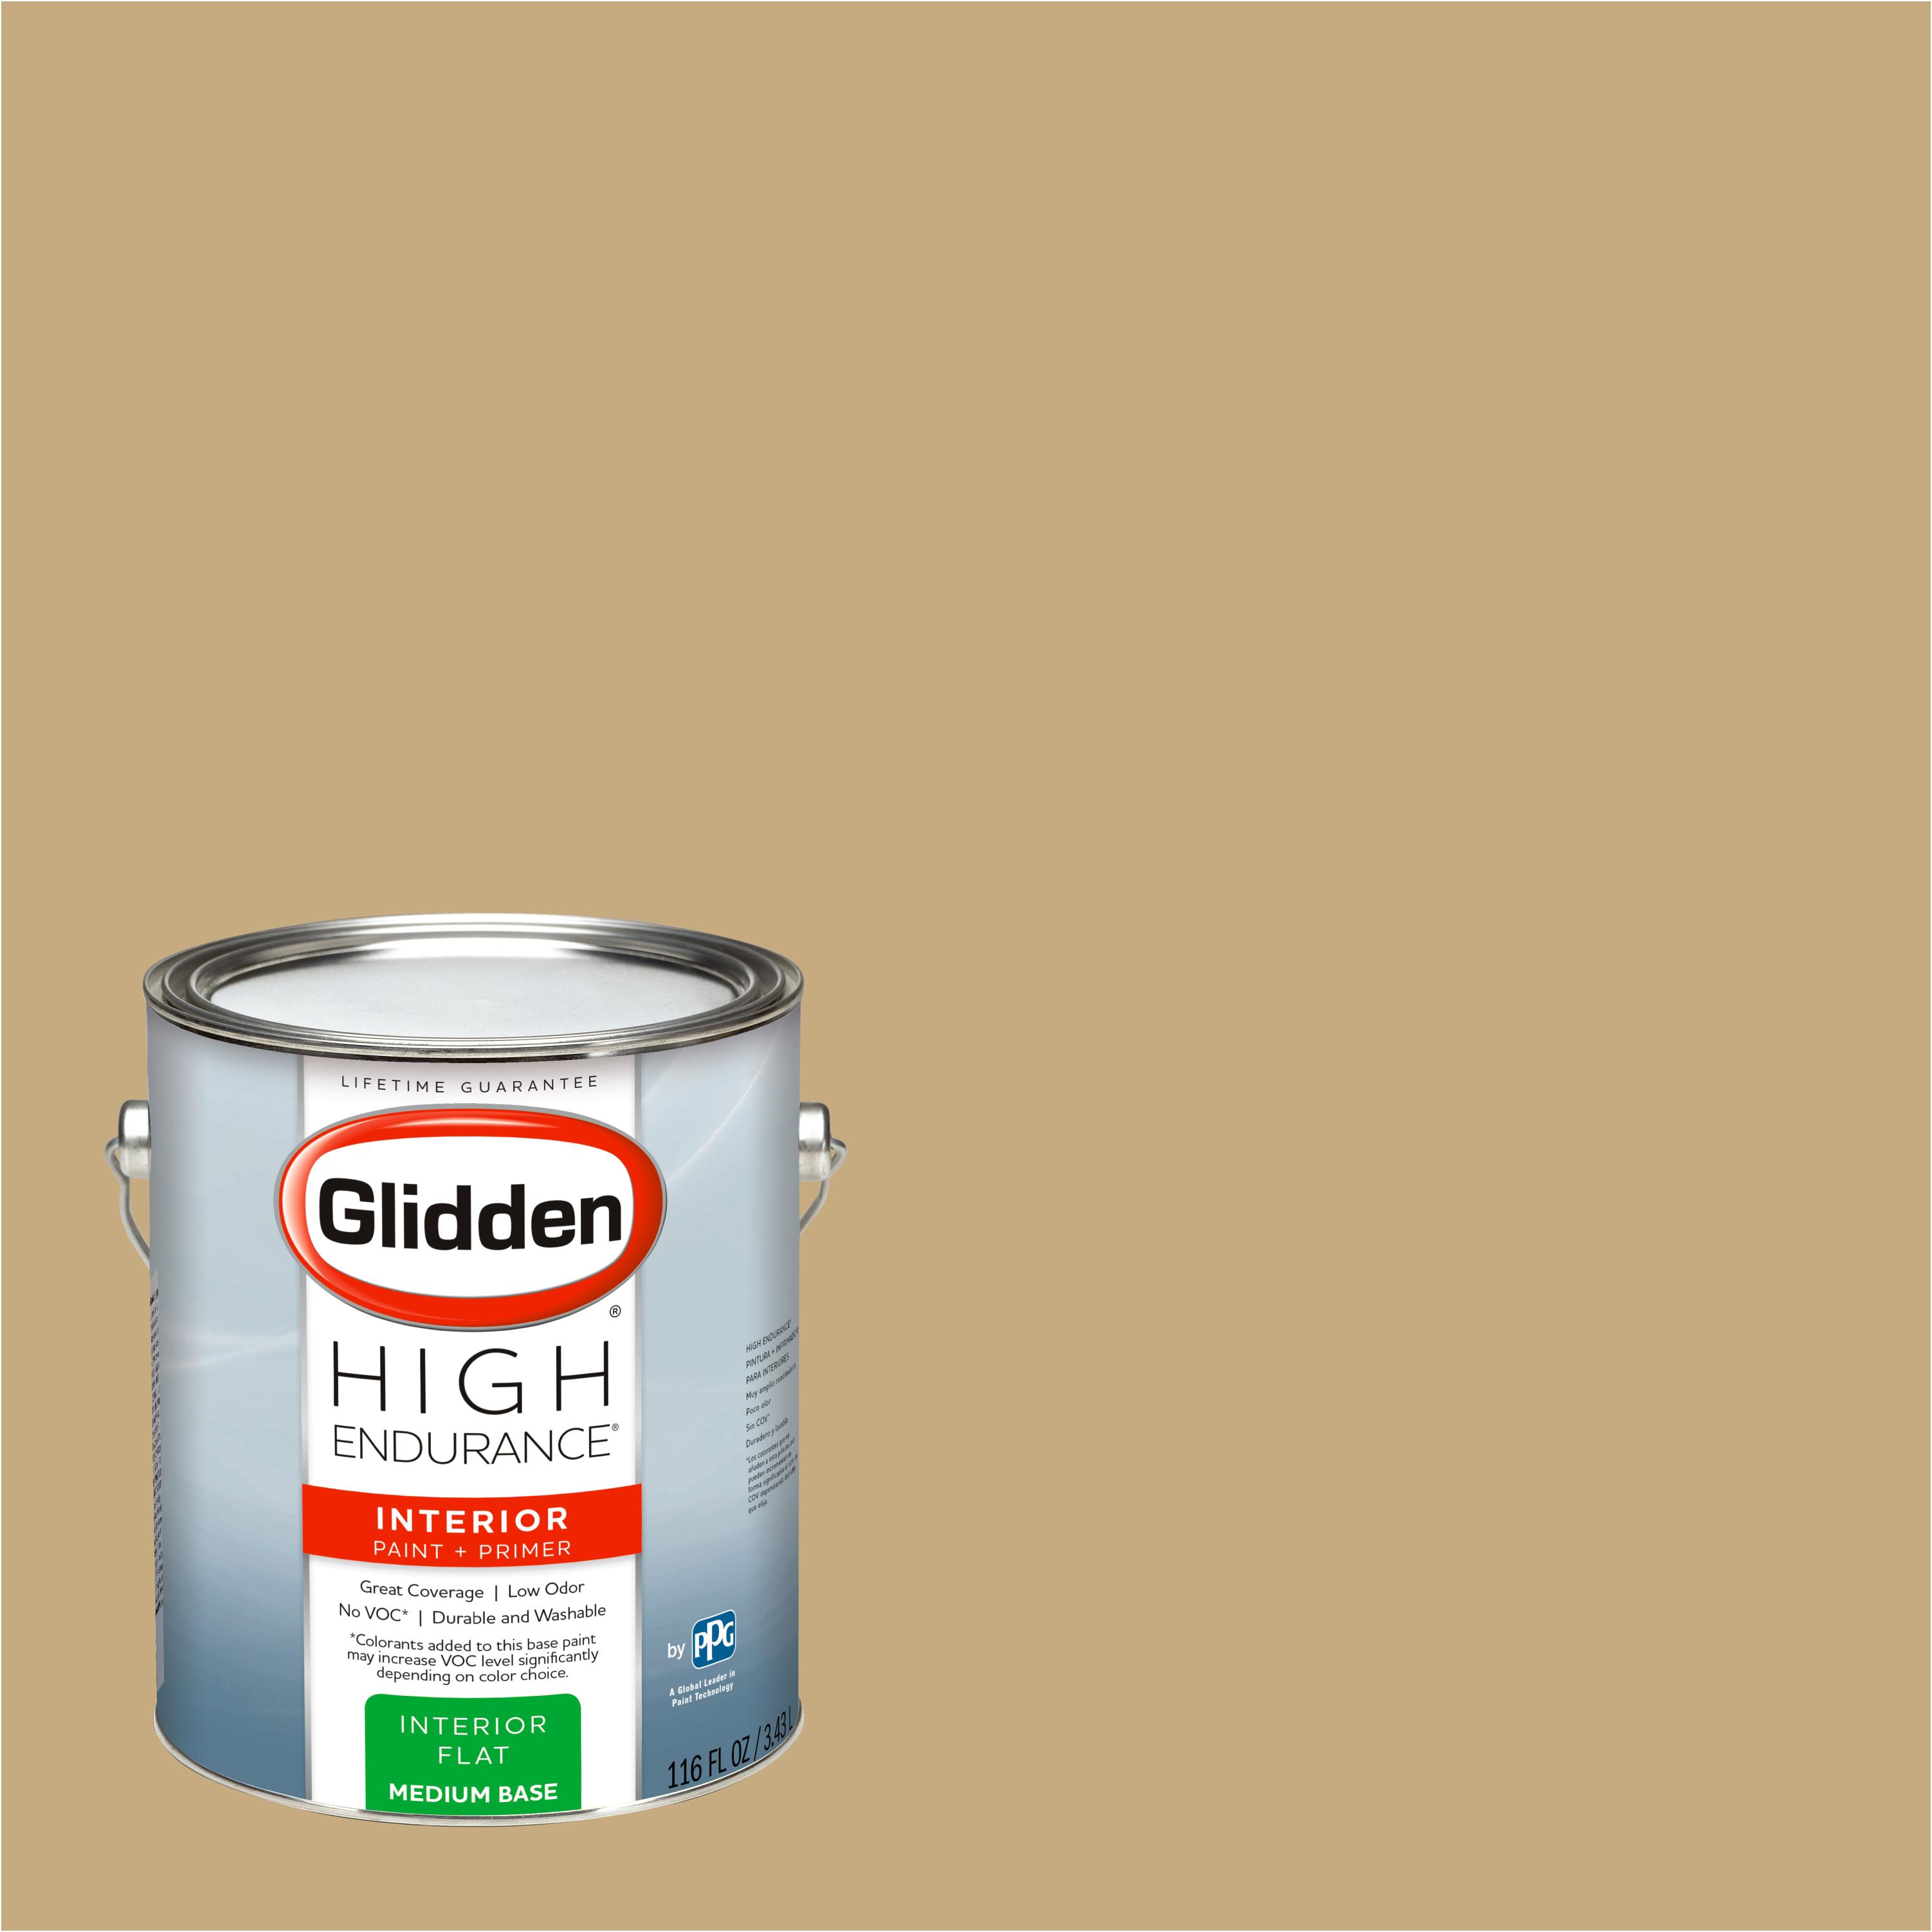 Glidden High Endurance, Interior Paint and Primer, Golden Needles, # 20YY 41/264